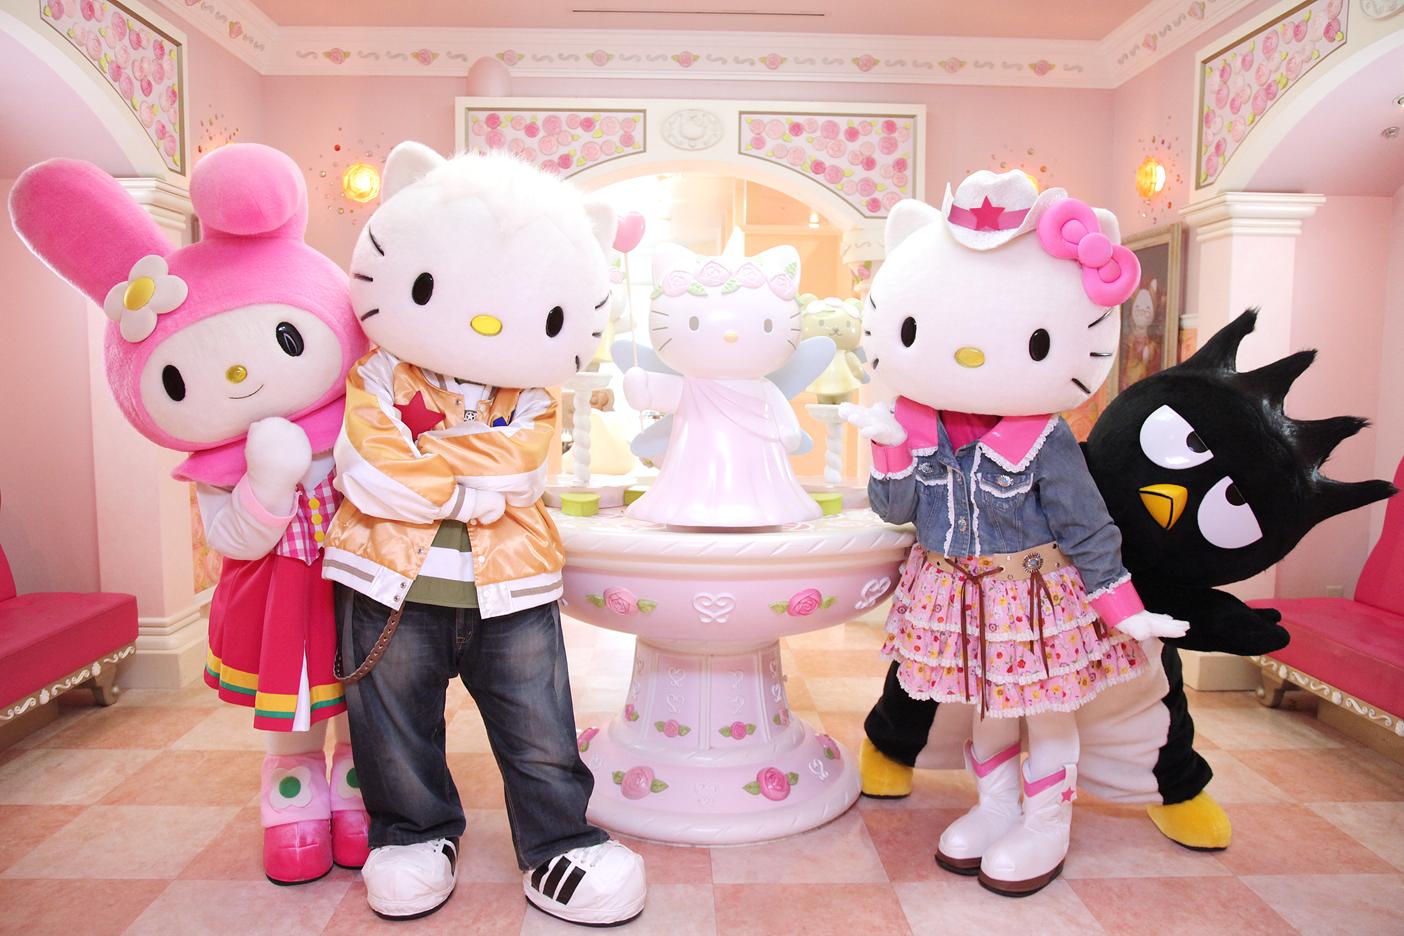 Hello-Kitty-and-friends-From-L-R-My-Melody-Dear-Daniel-Hello-Kitty-Bad-Badtz-maru